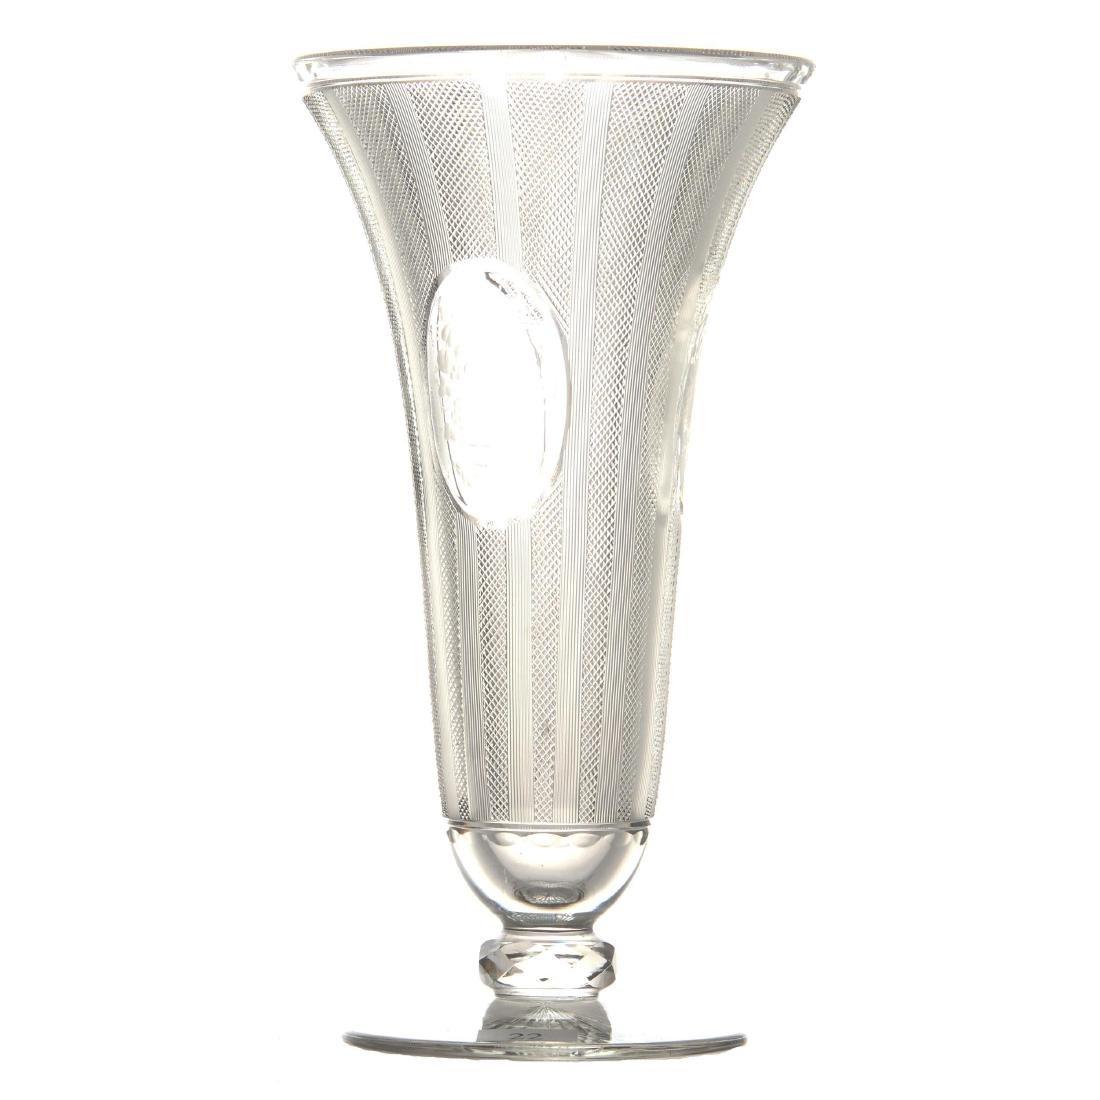 "Pedestal Vase - 10"" - ABCG"